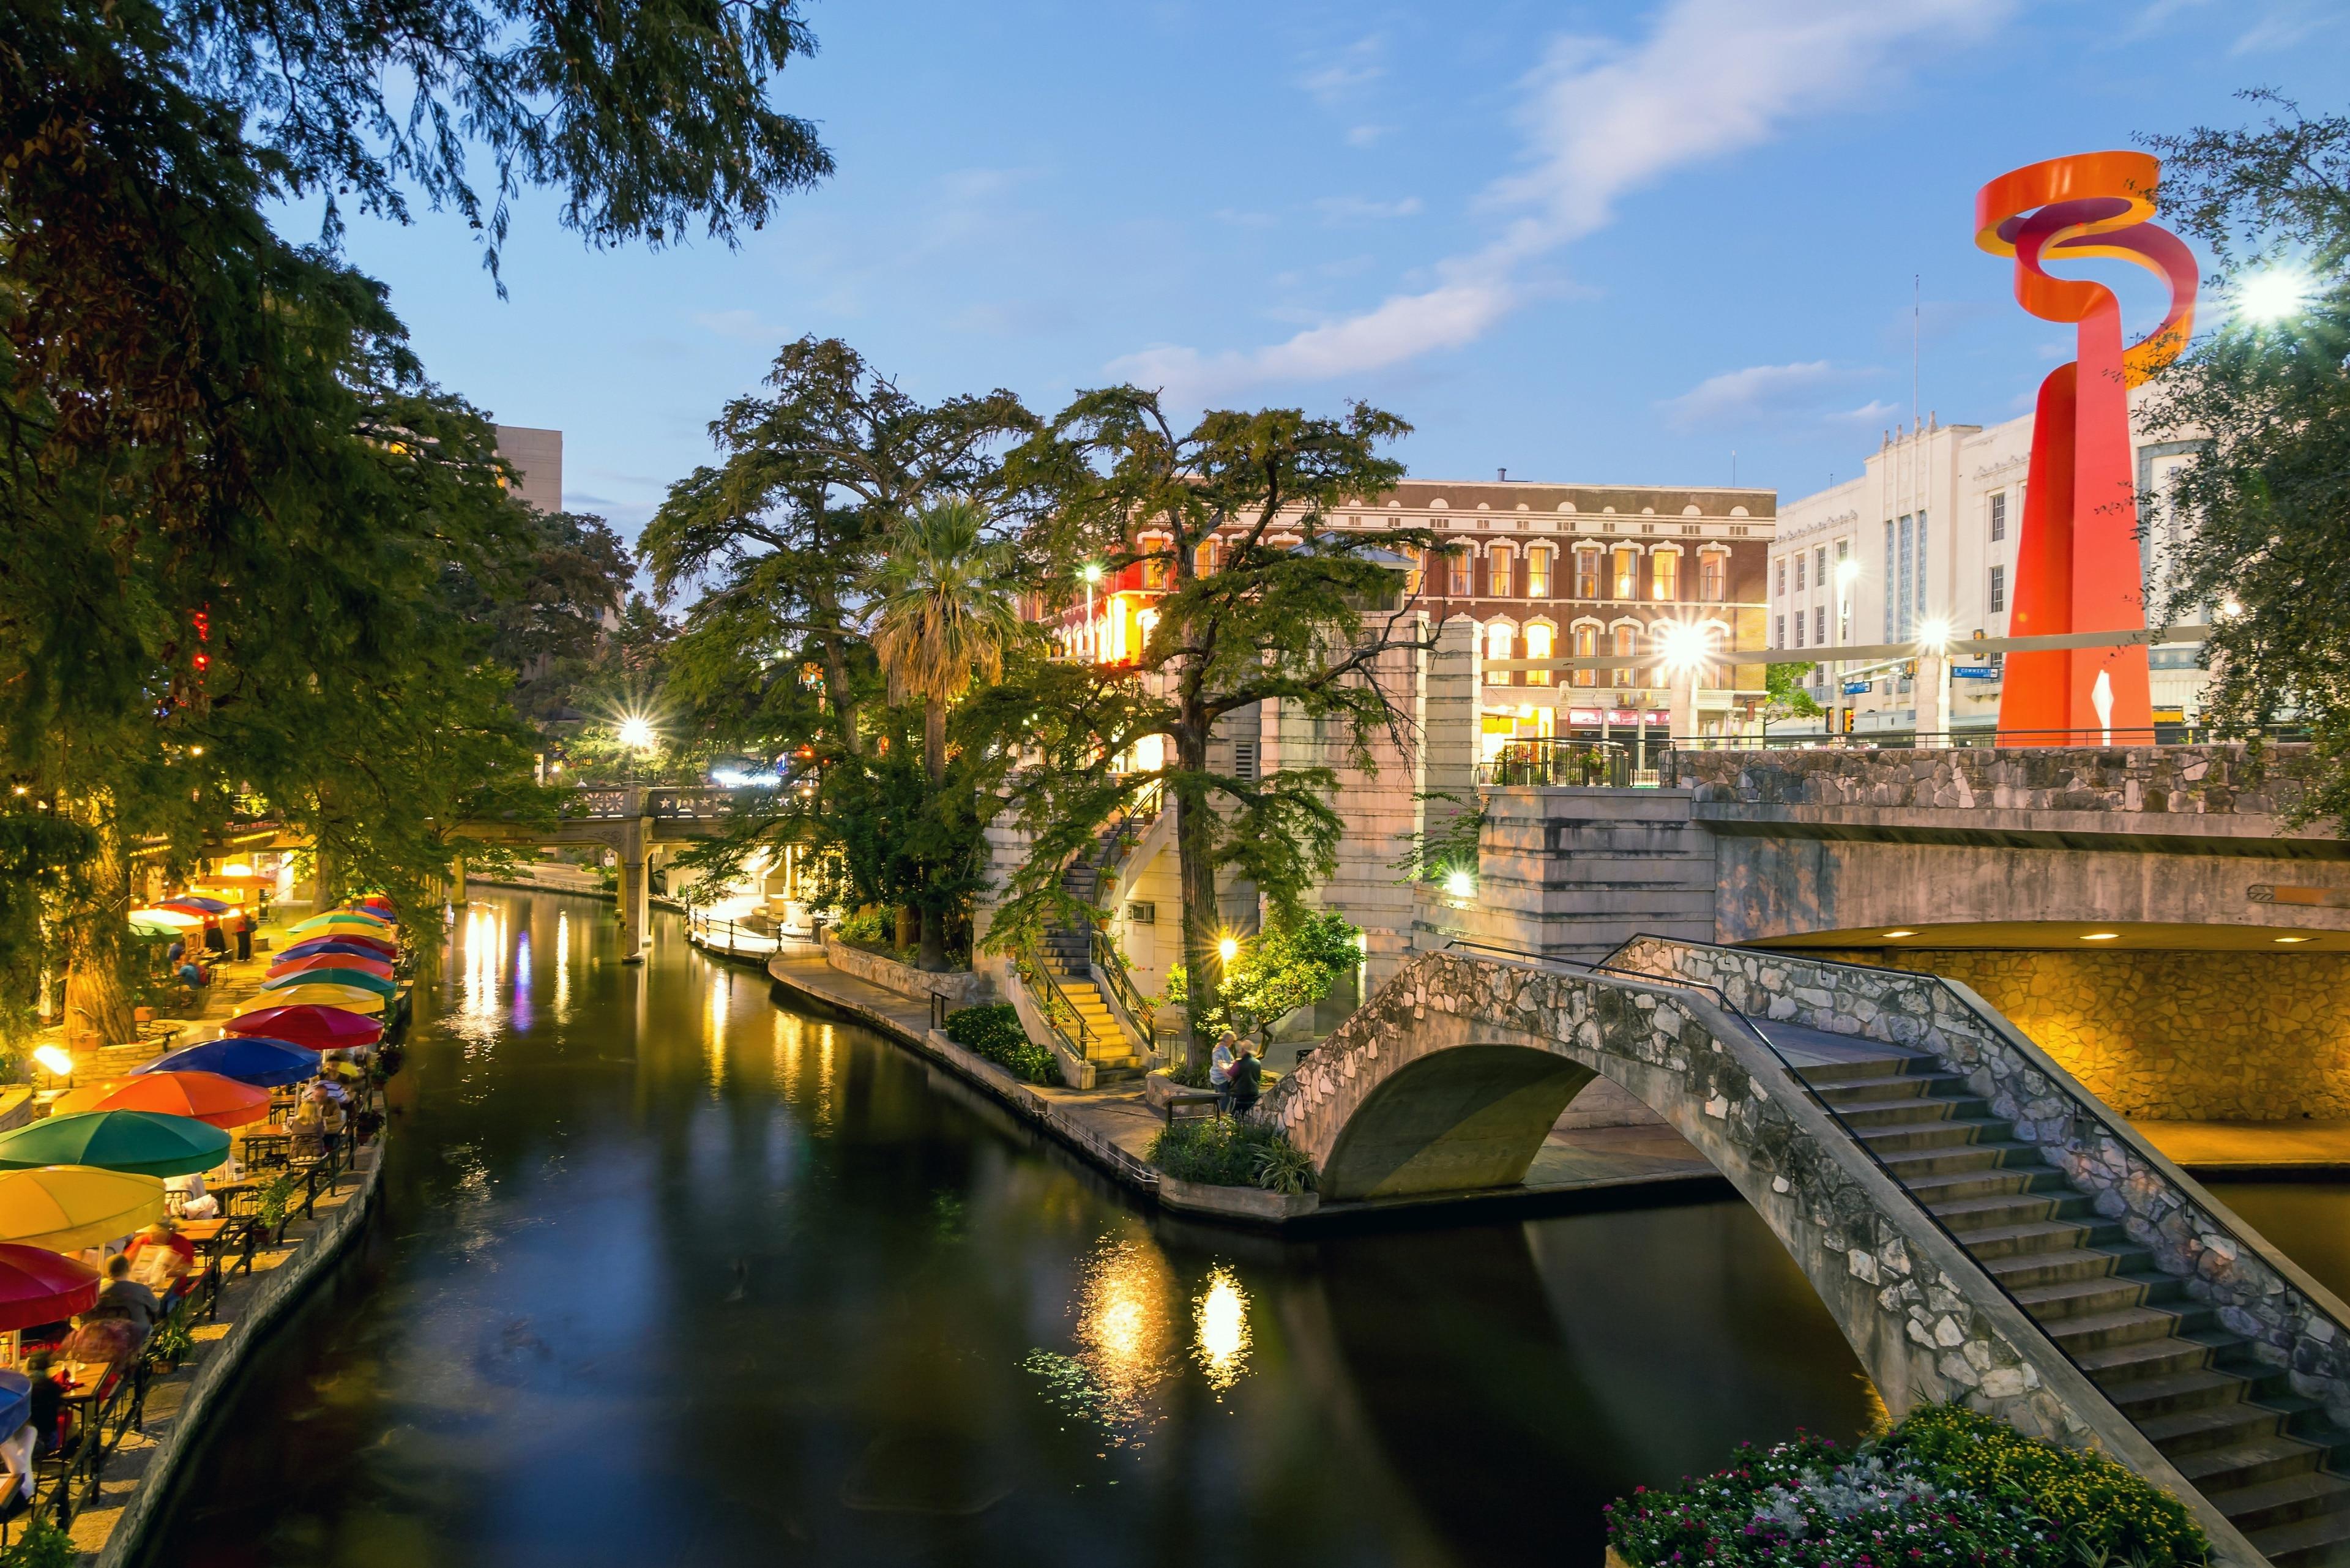 River Walk, San Antonio, Texas, United States of America